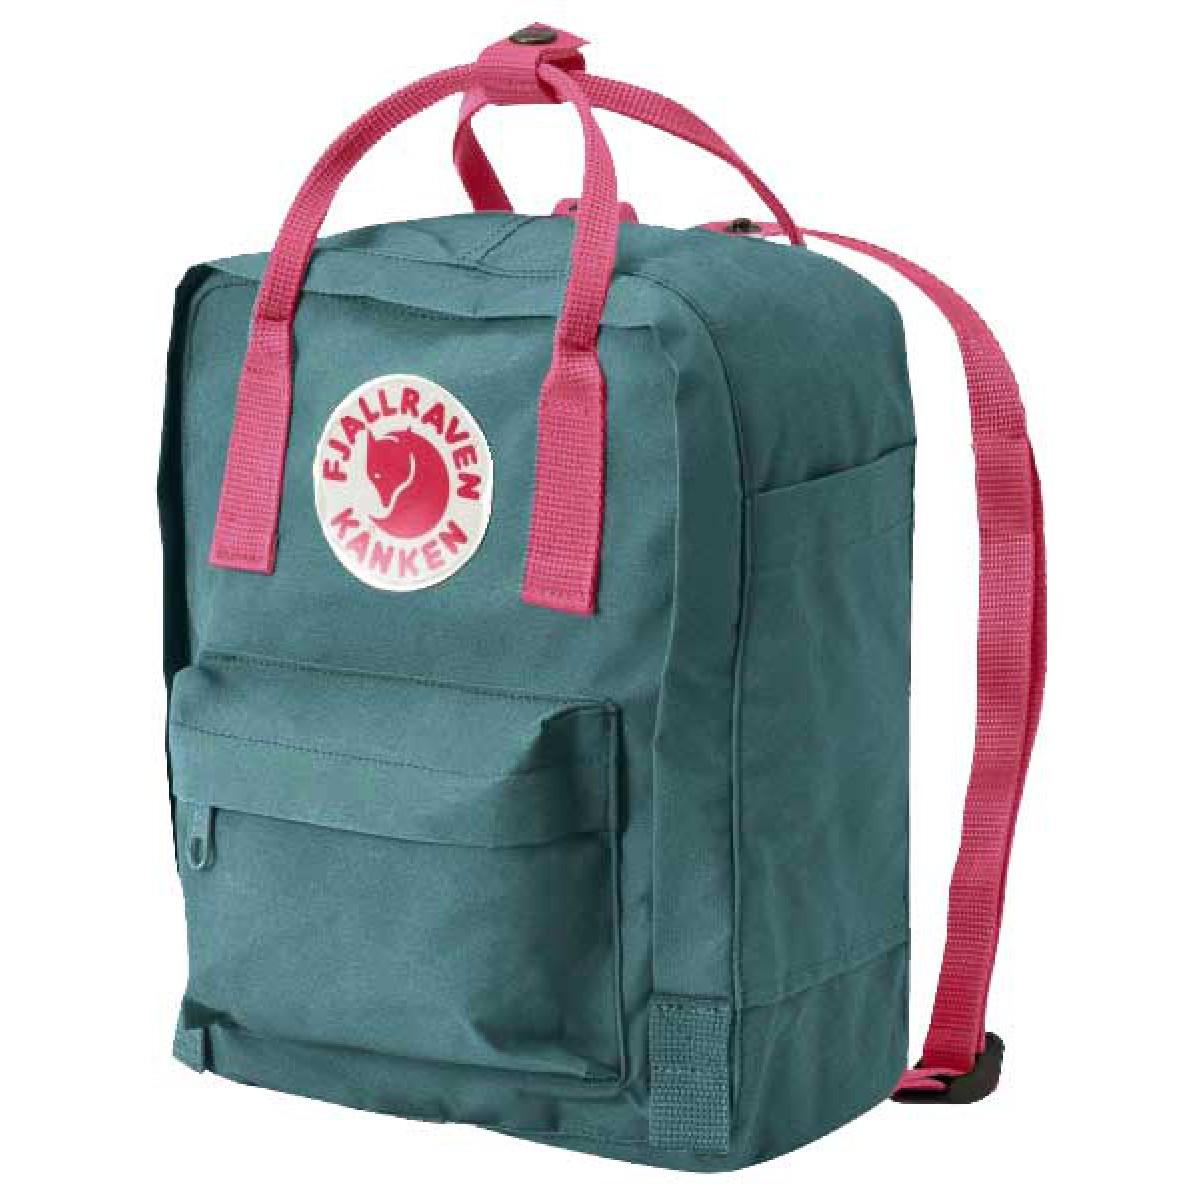 código promocional 14124 80050 Fjallraven Kanken mochila mini Verde bosque Rosa